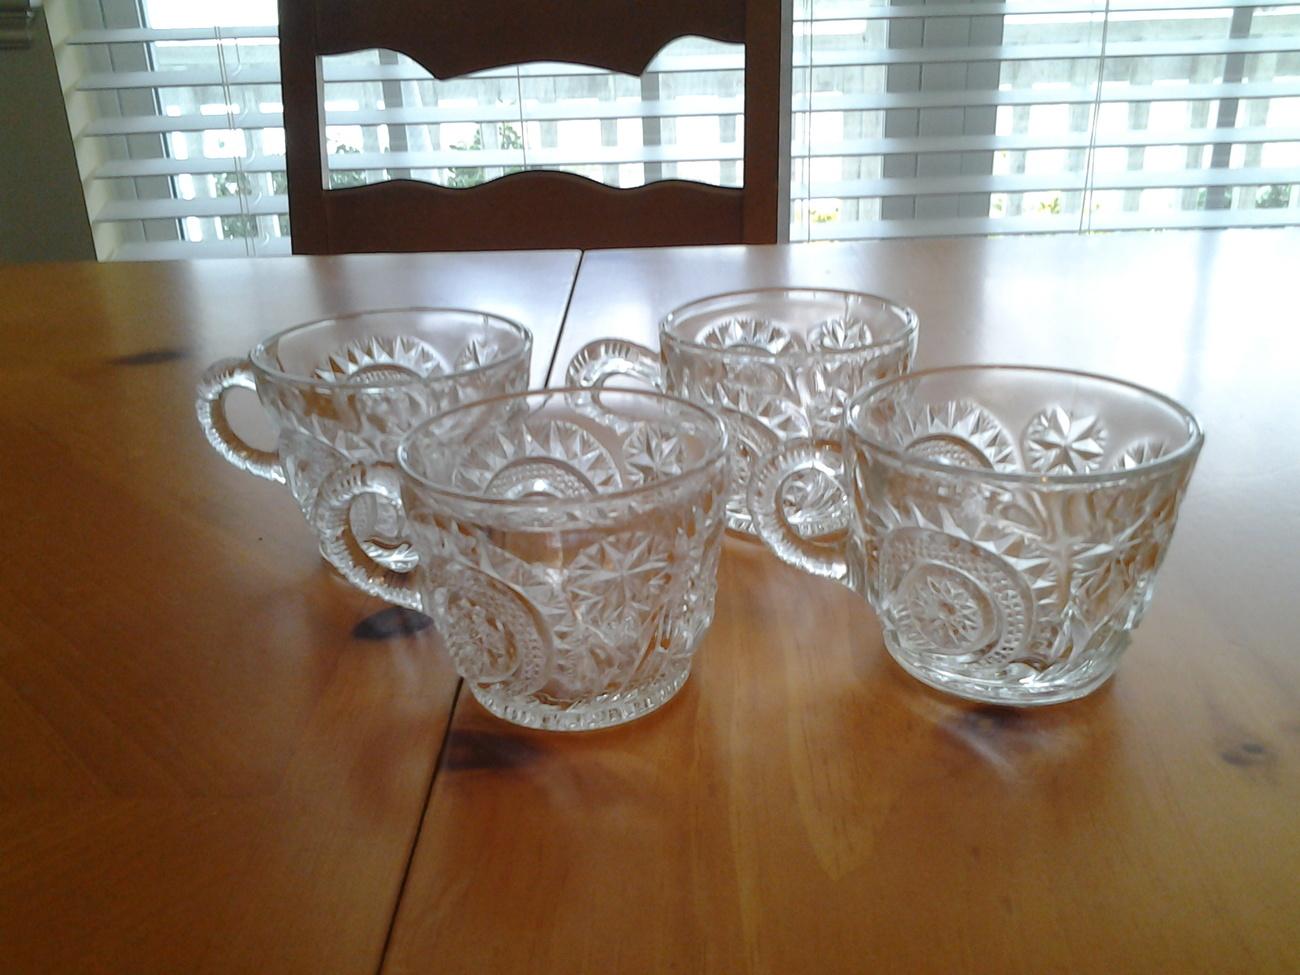 LE Smith Pinwheel & Stars (4)  Glass Punch mugs  Starbase straight pattern